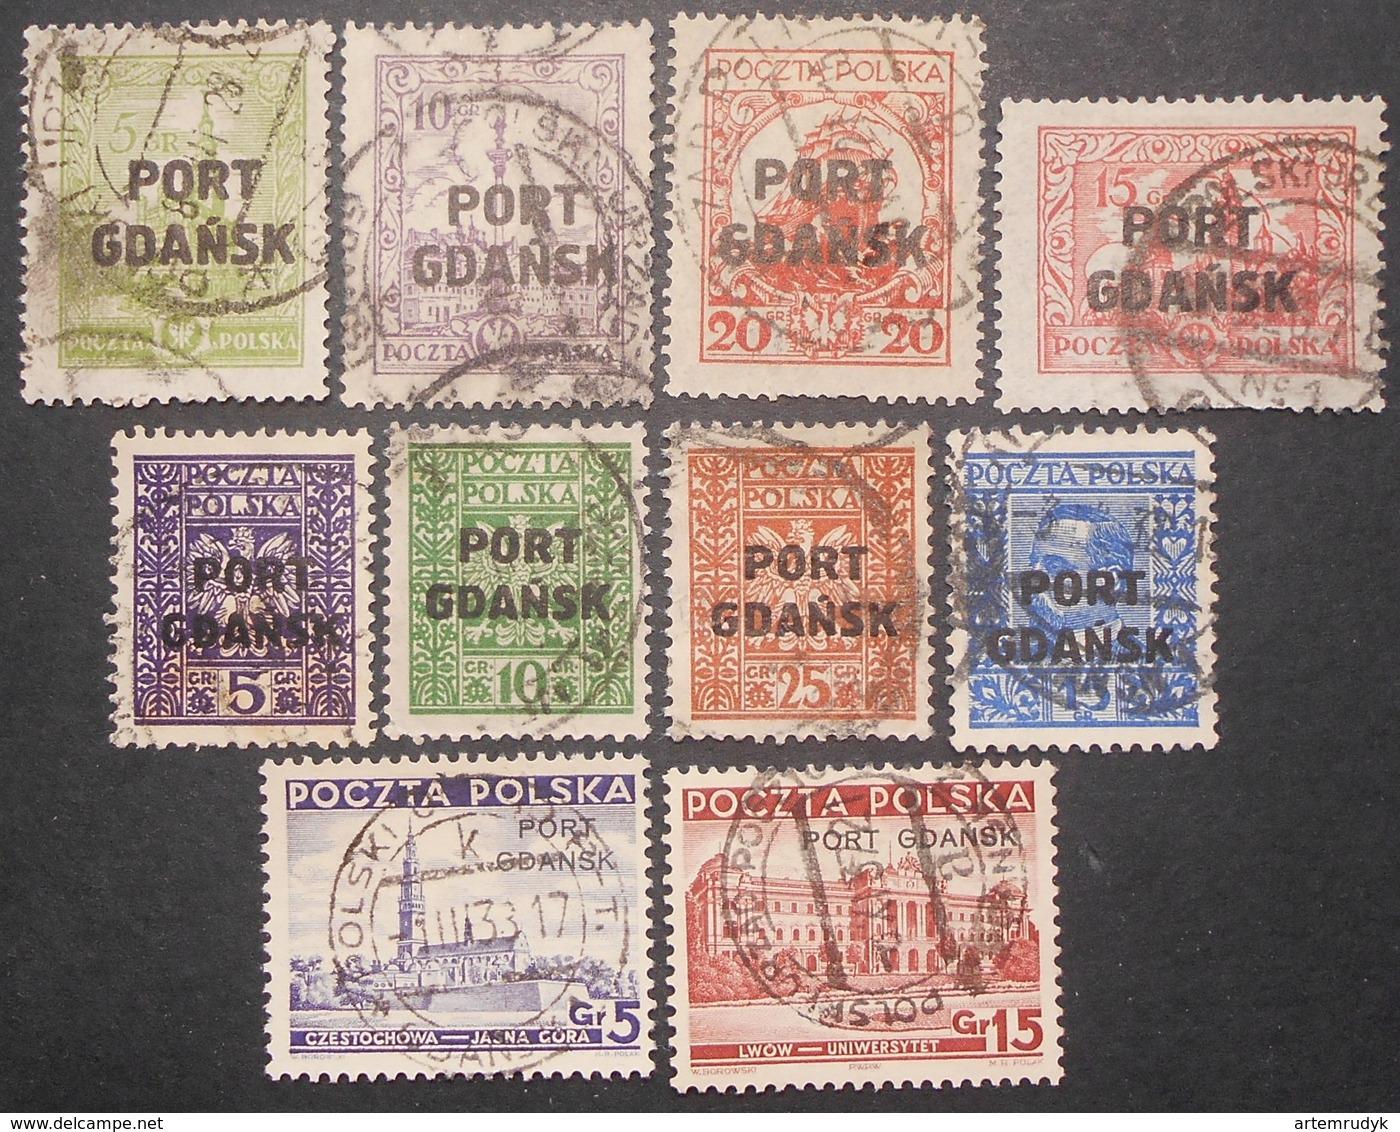 Poland - Port Gdansk 1926-1937 Group Of Stamps, Mi #15-18II, 20-22, 24, 32-33, Used, CV=57€ - 1919-1939 Republic